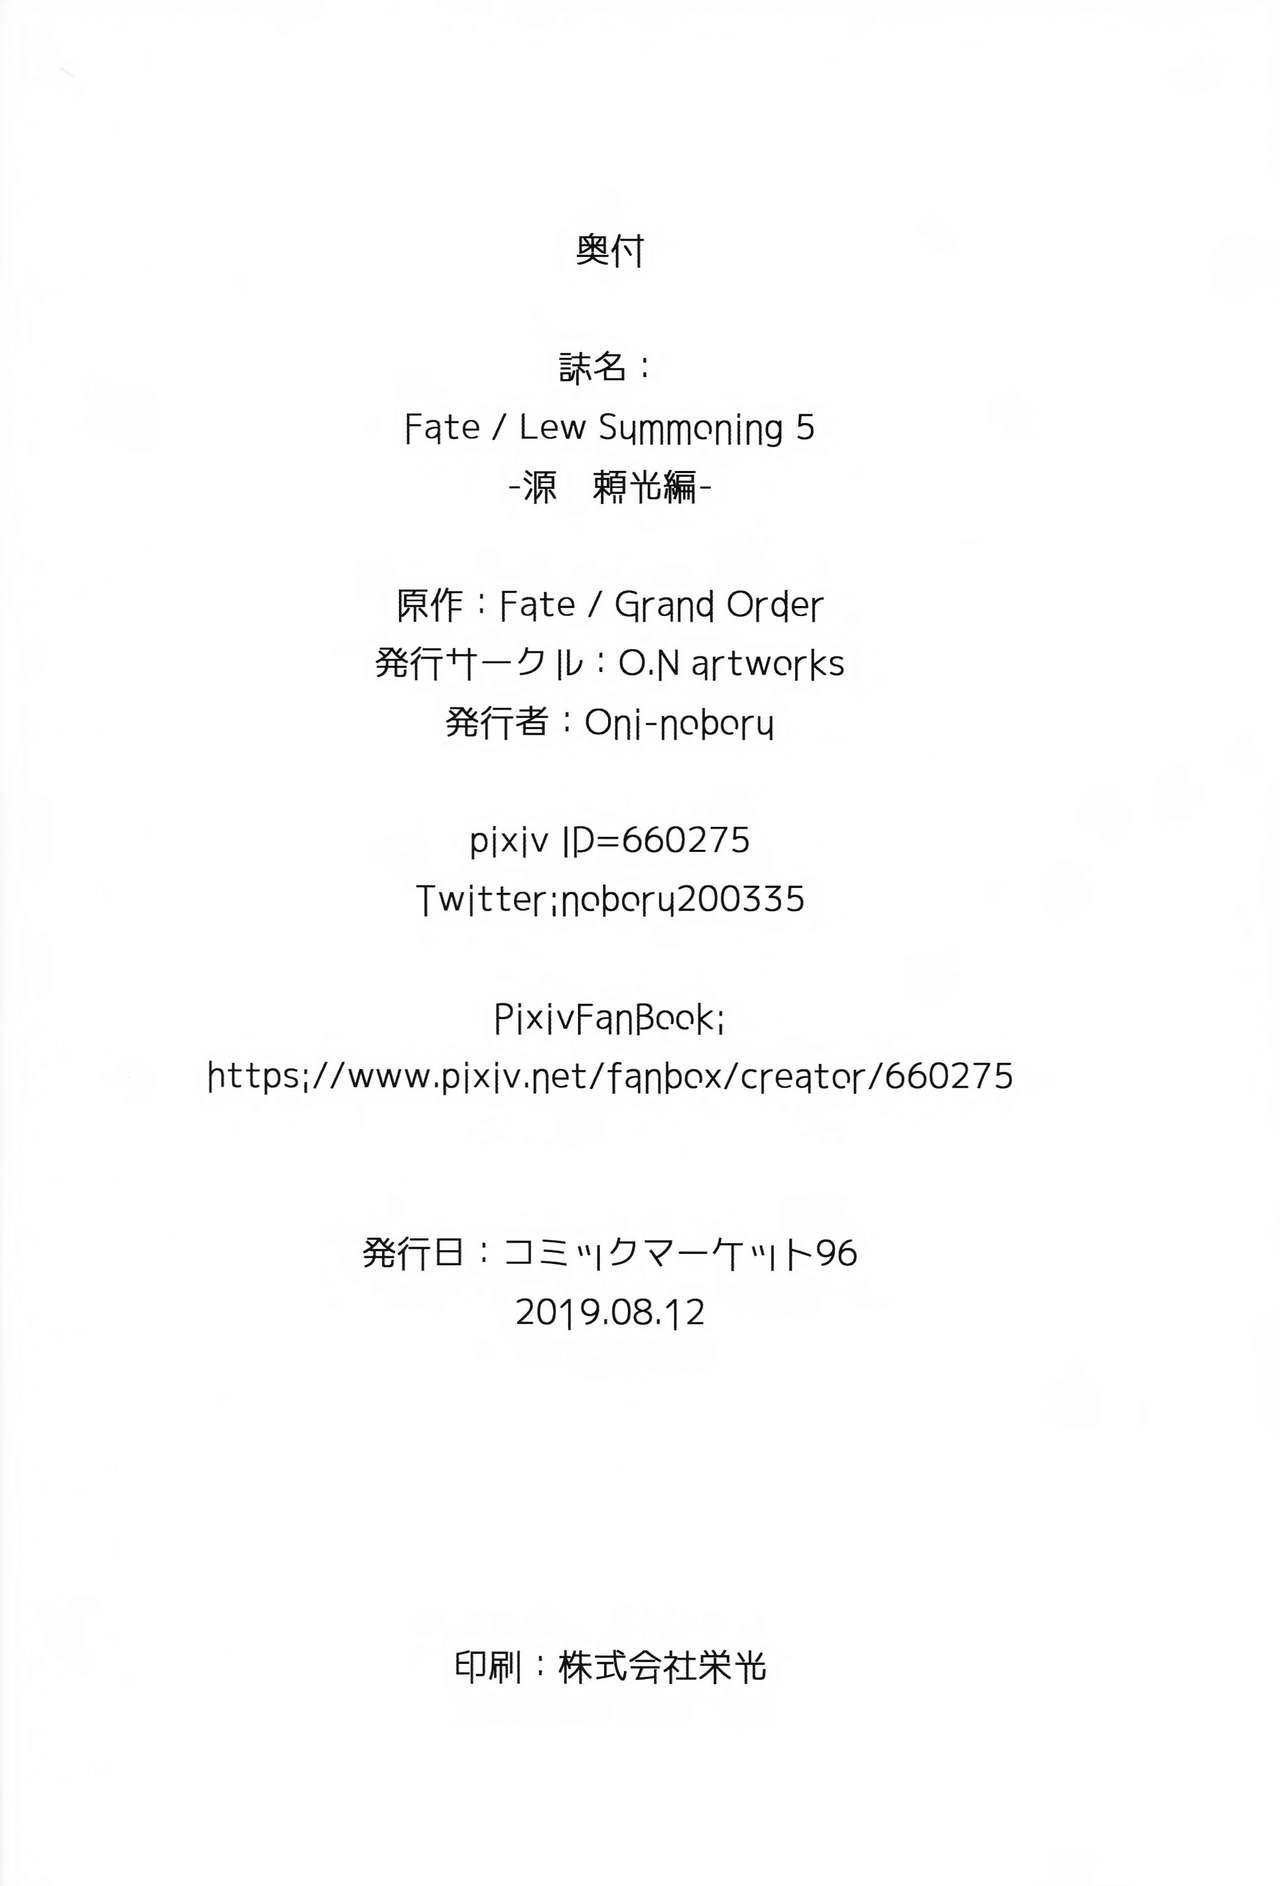 Fate/Lewd Summoning 5 20